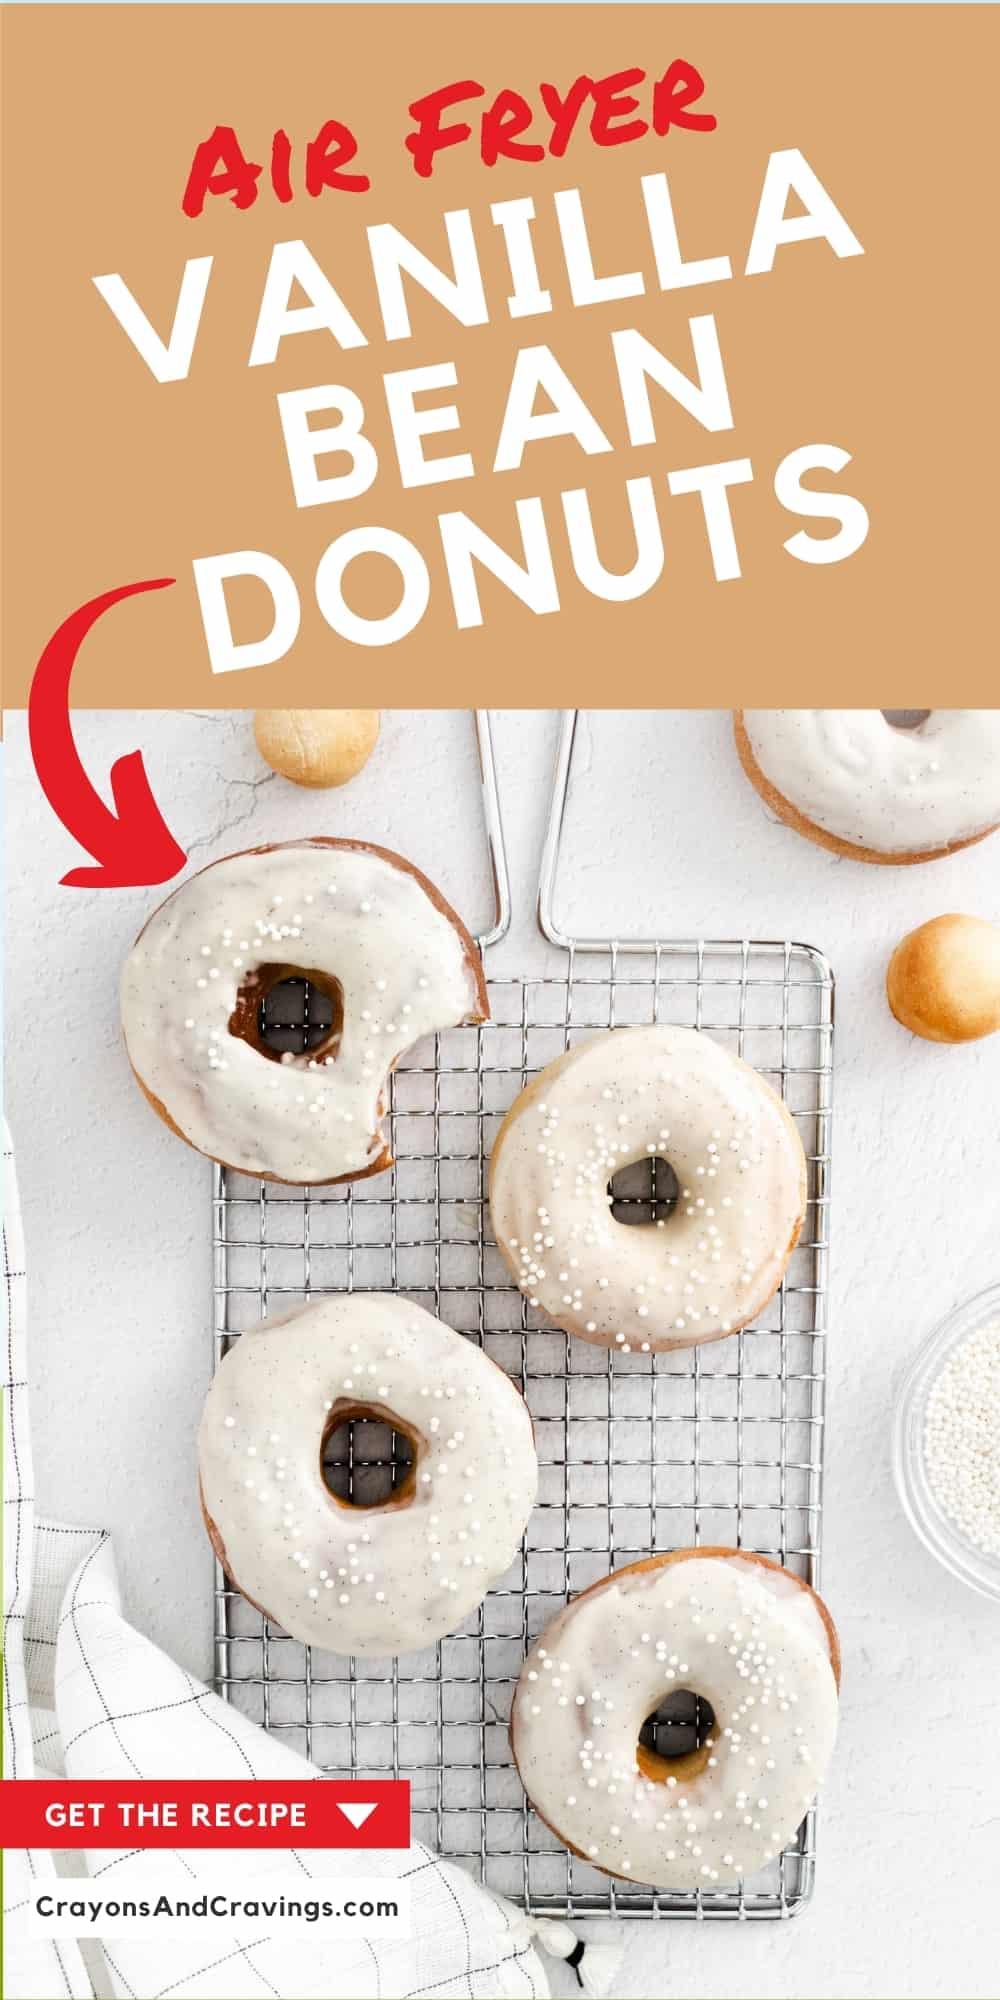 Air Fryer Vanilla Bean Donuts